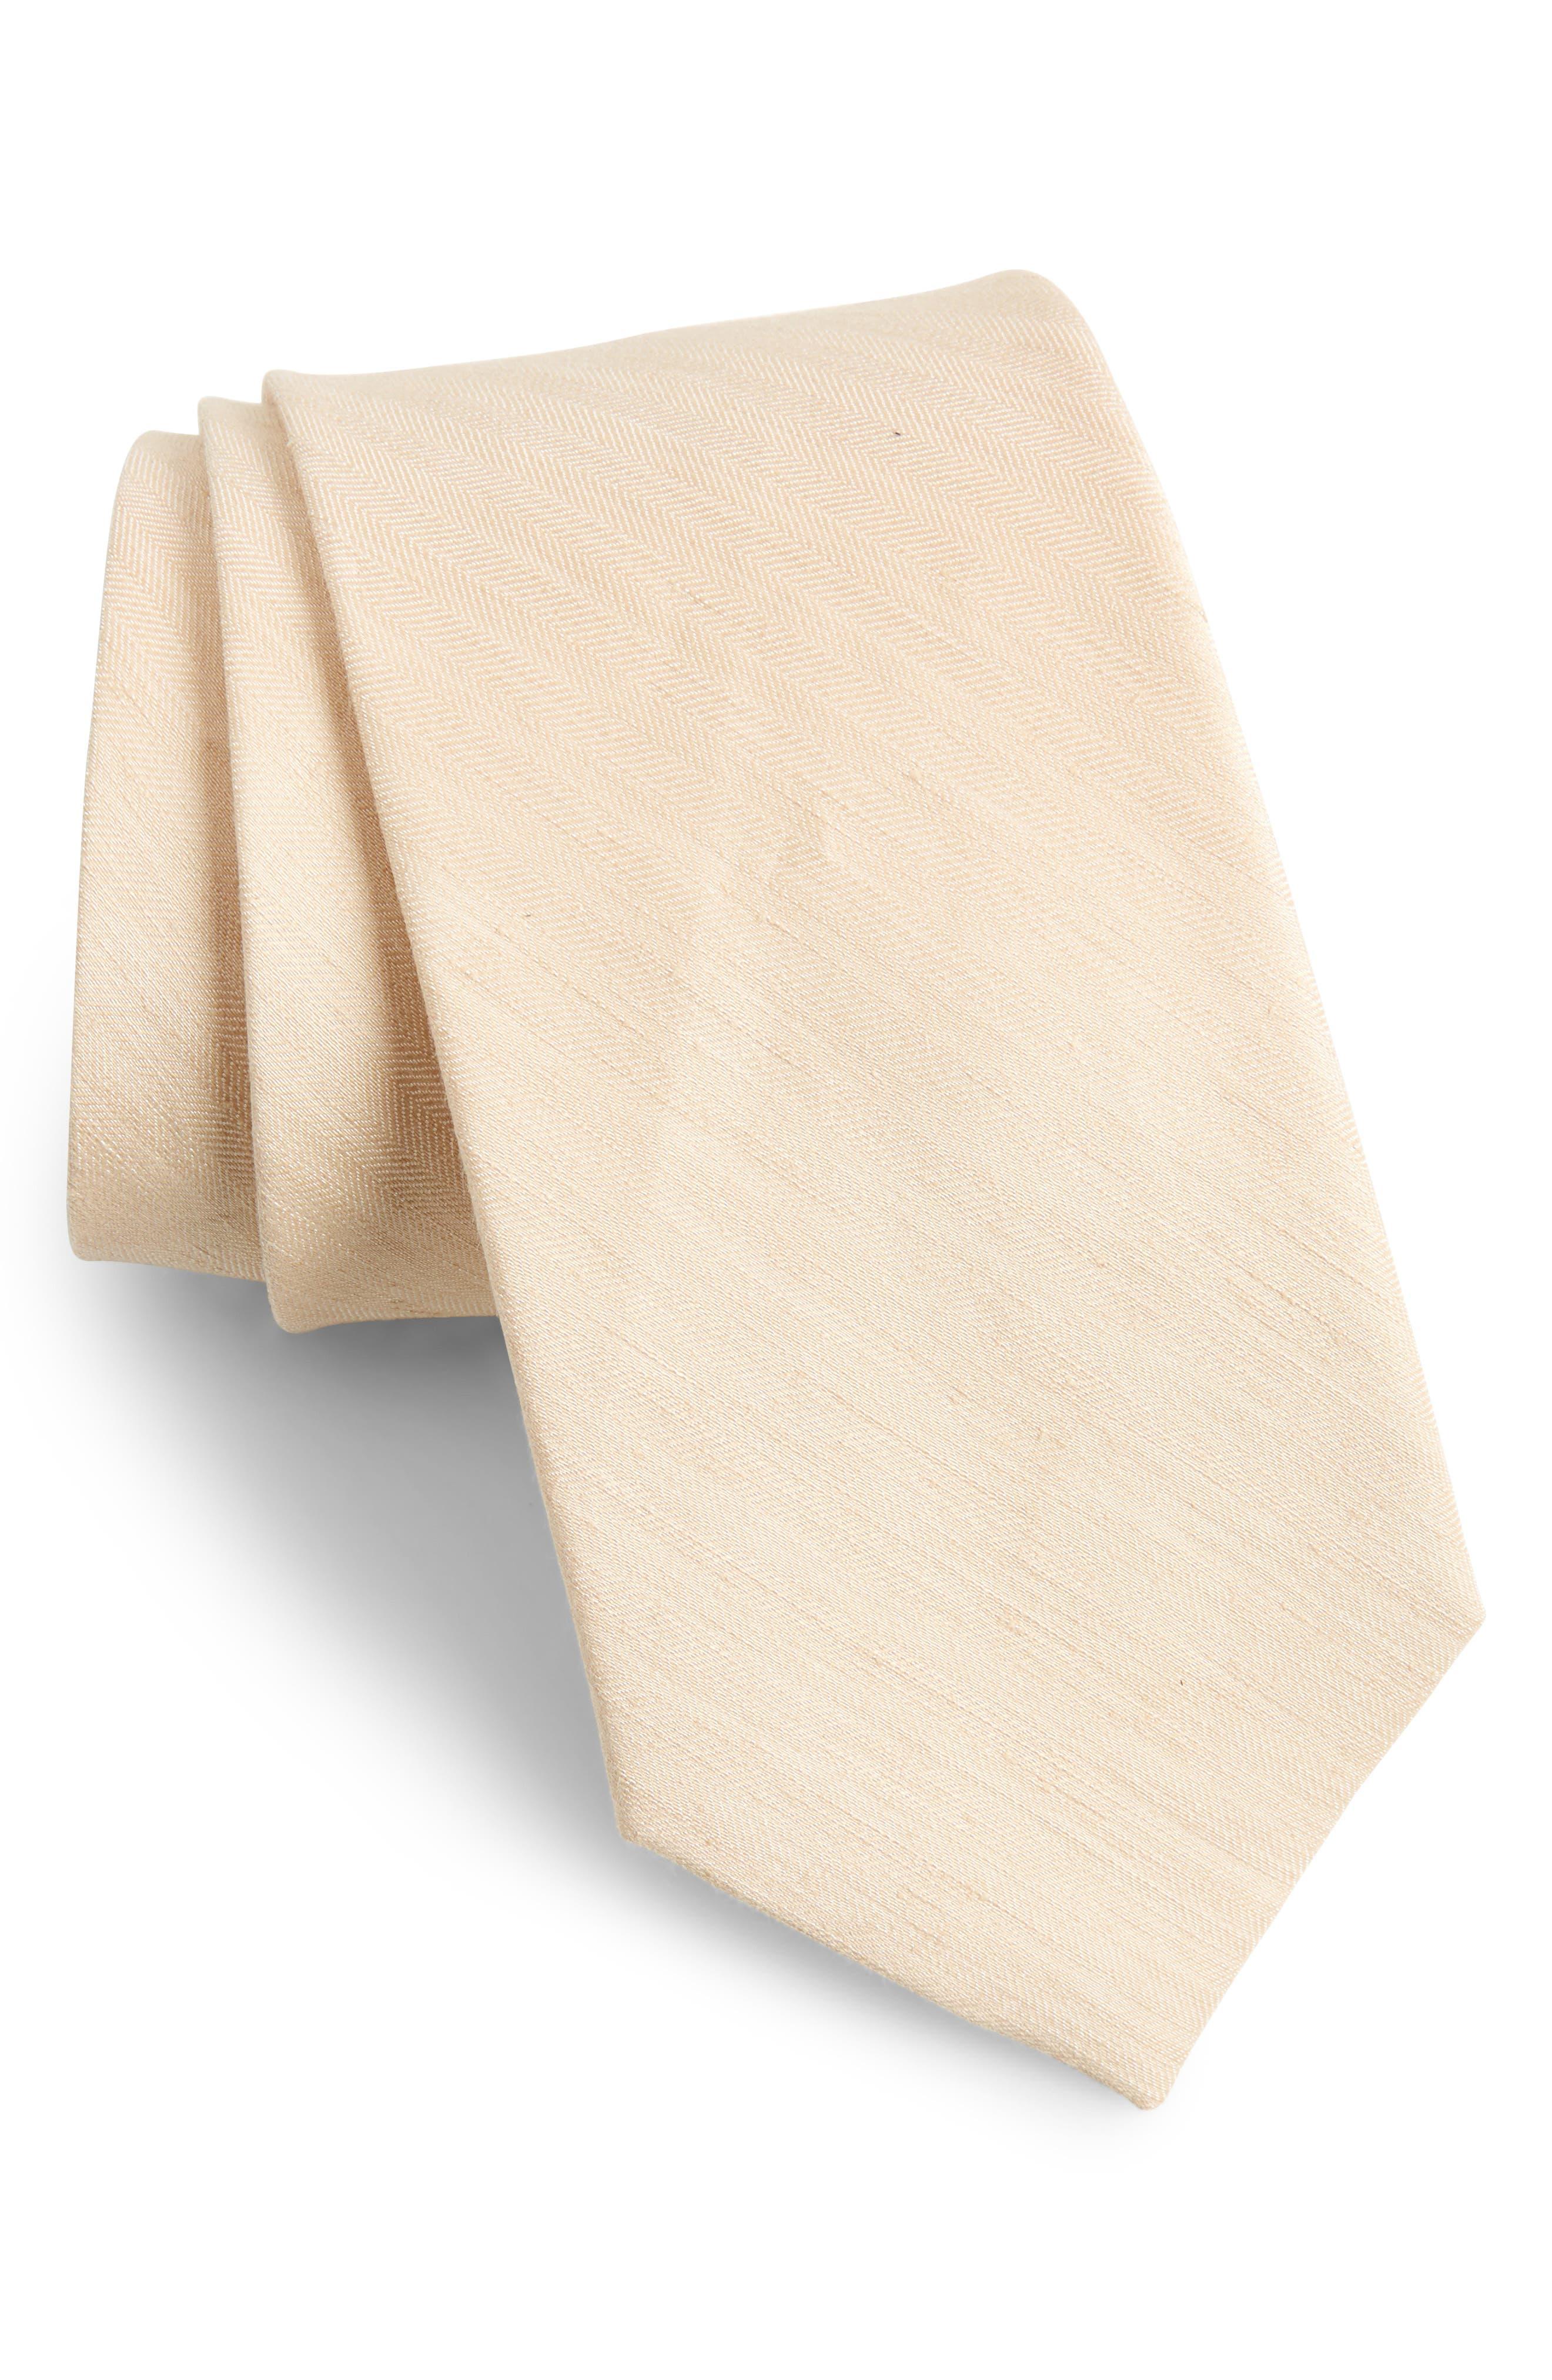 Main Image - The Tie Bar Linen Row Linen & Silk Tie (X-Long)